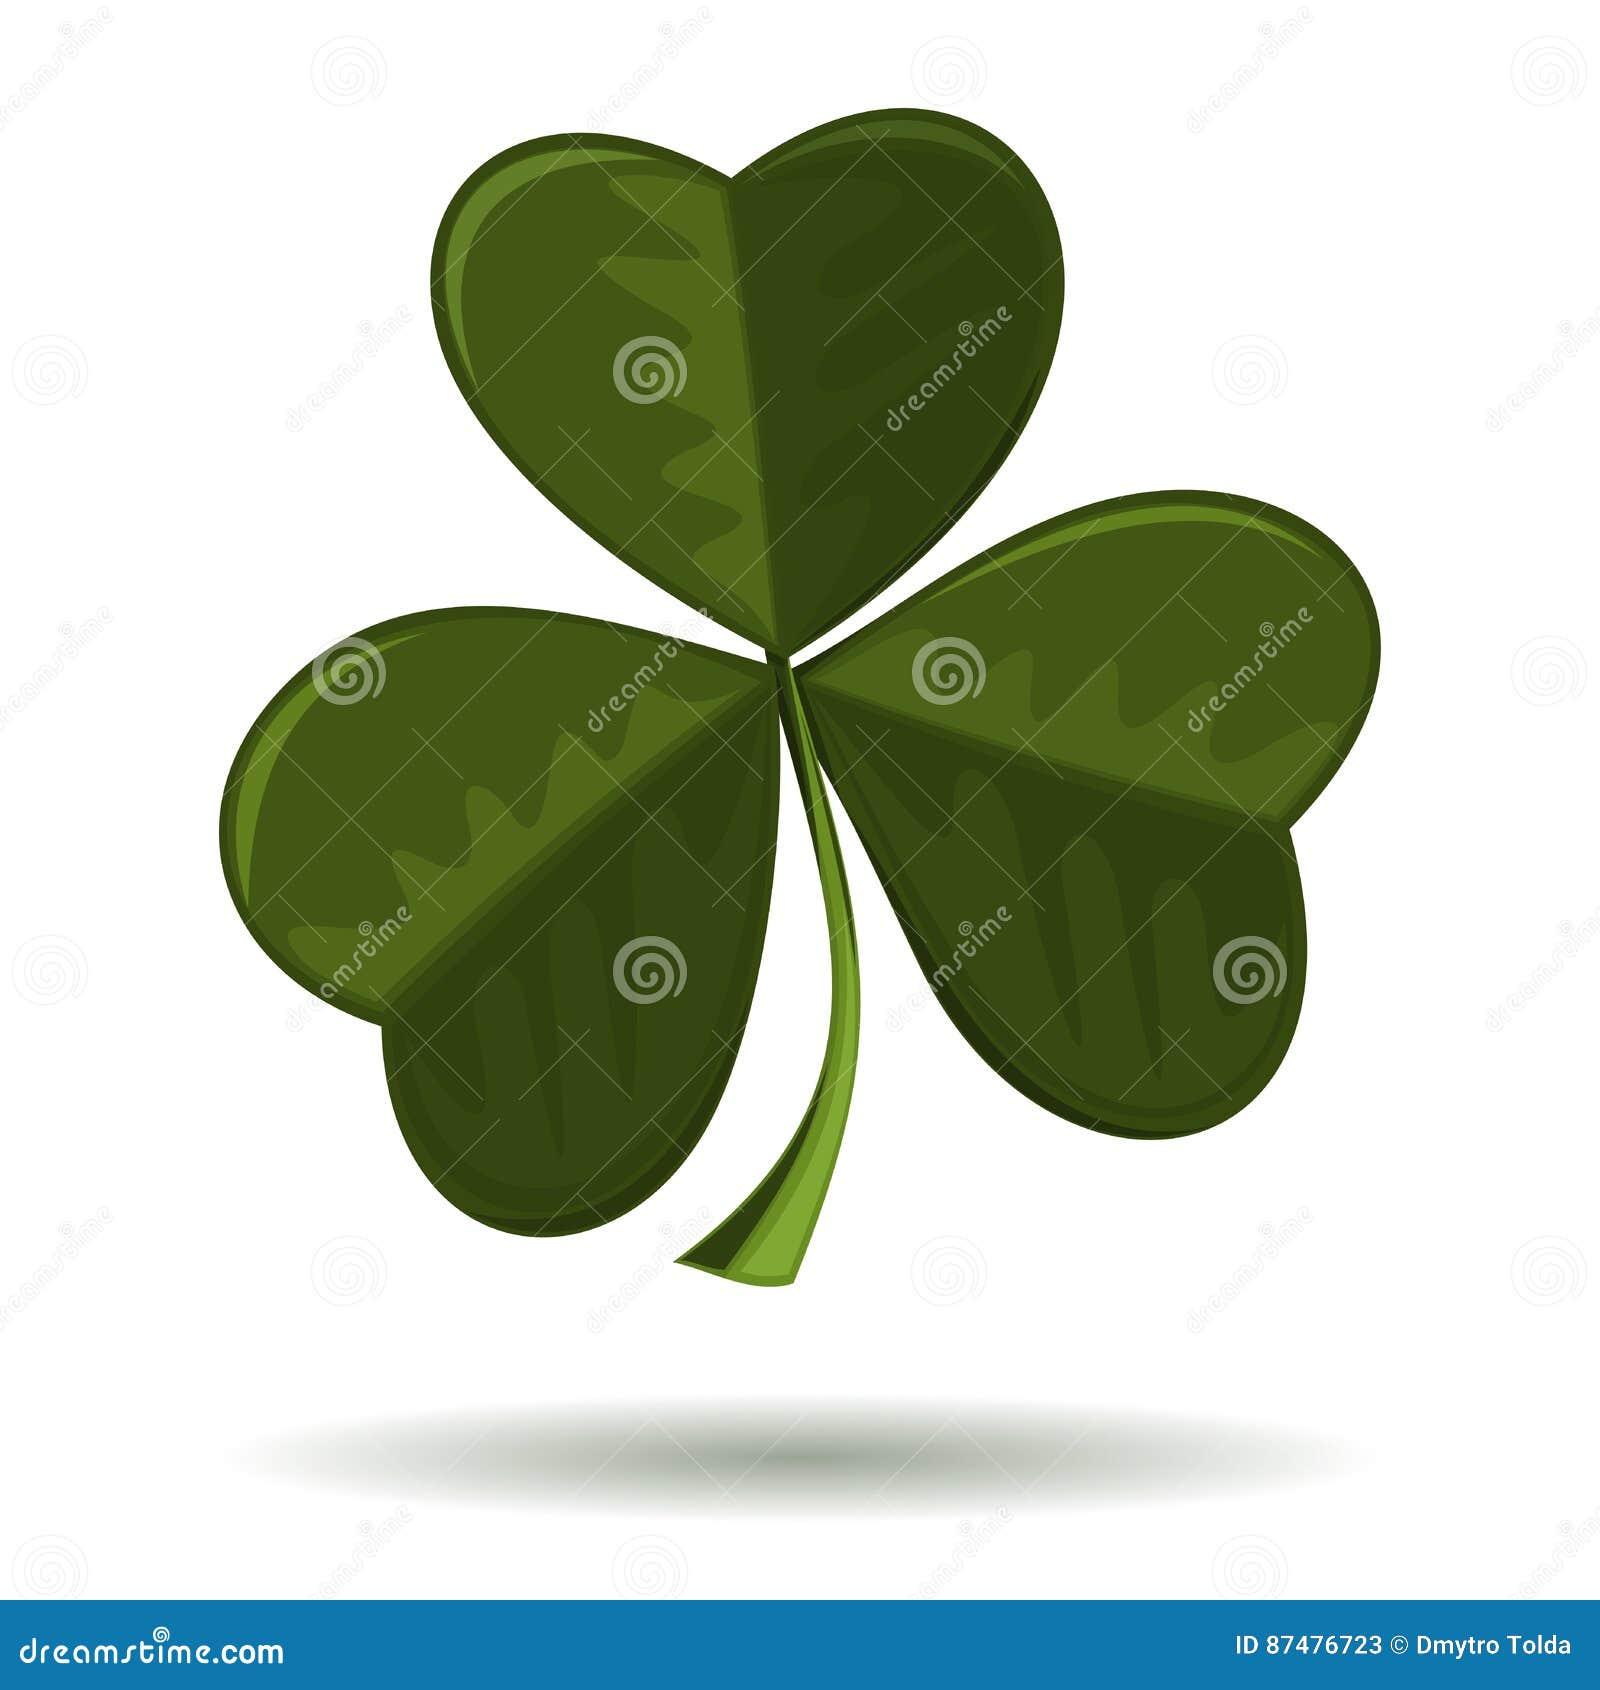 Shamrock, seamrog, trifoliate клевер - символ Ирландии и торжество дня St Patricks